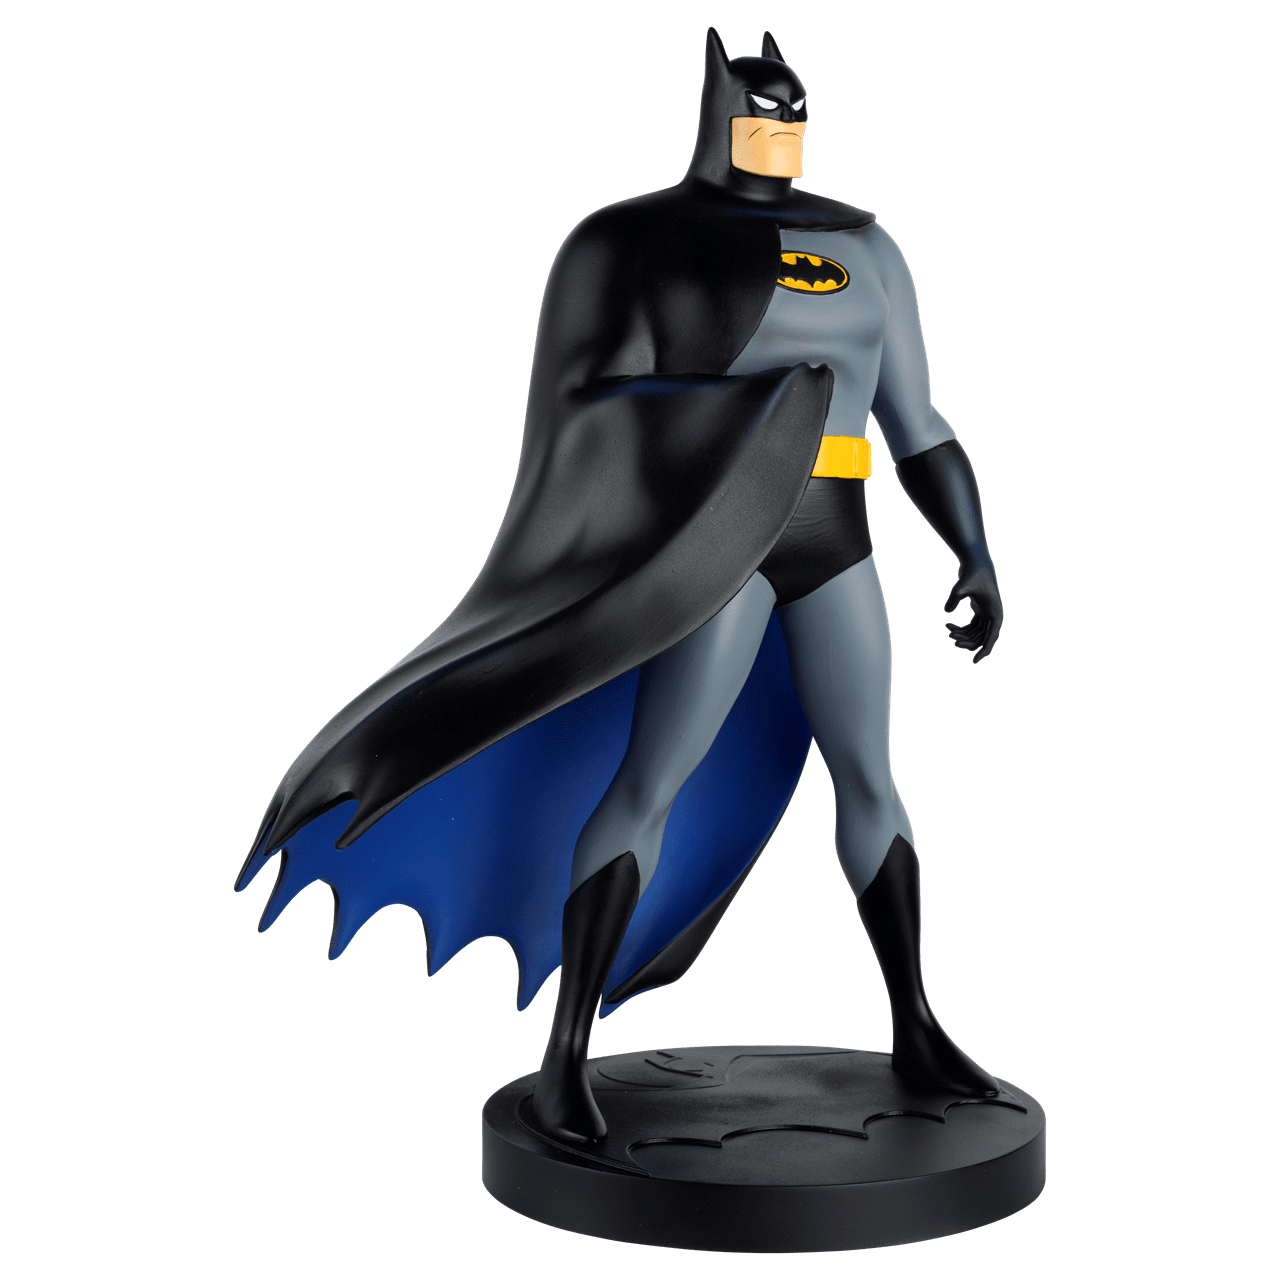 Batman Animation: DC Mega Figurine (online only) Hero Collector - 2